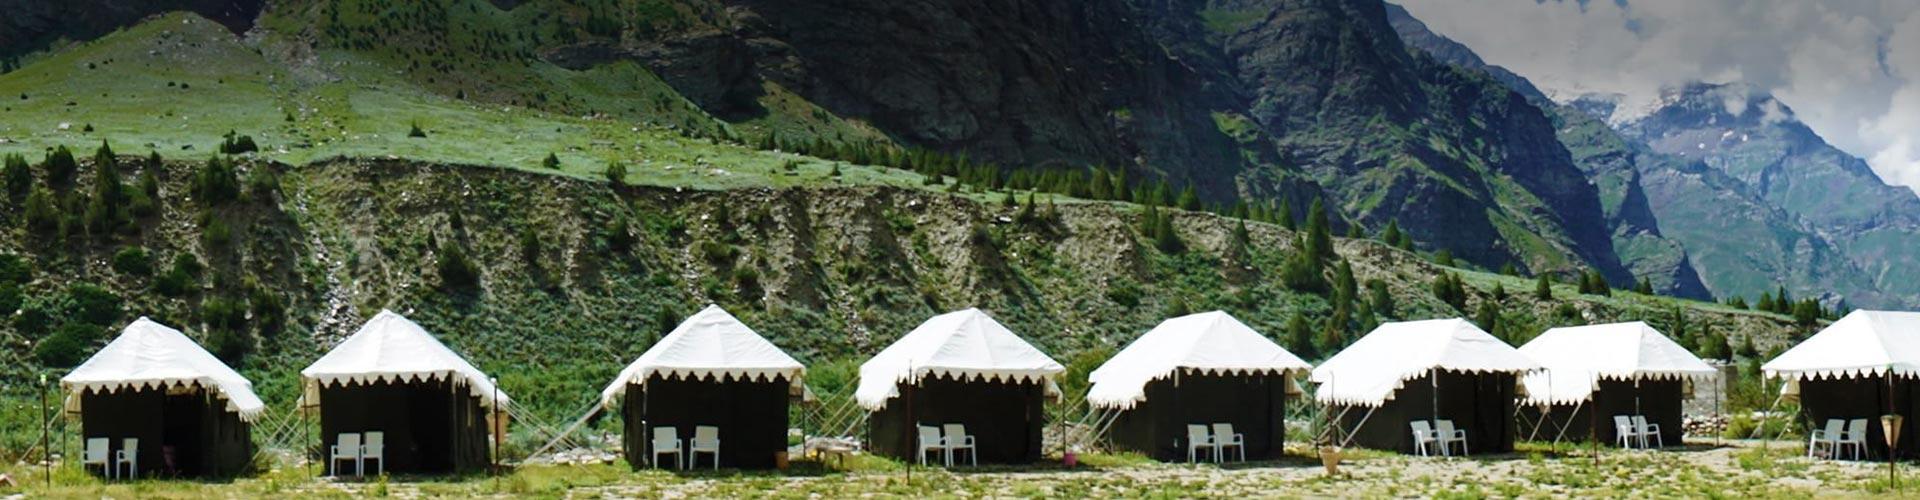 Jispa Journeys Resort